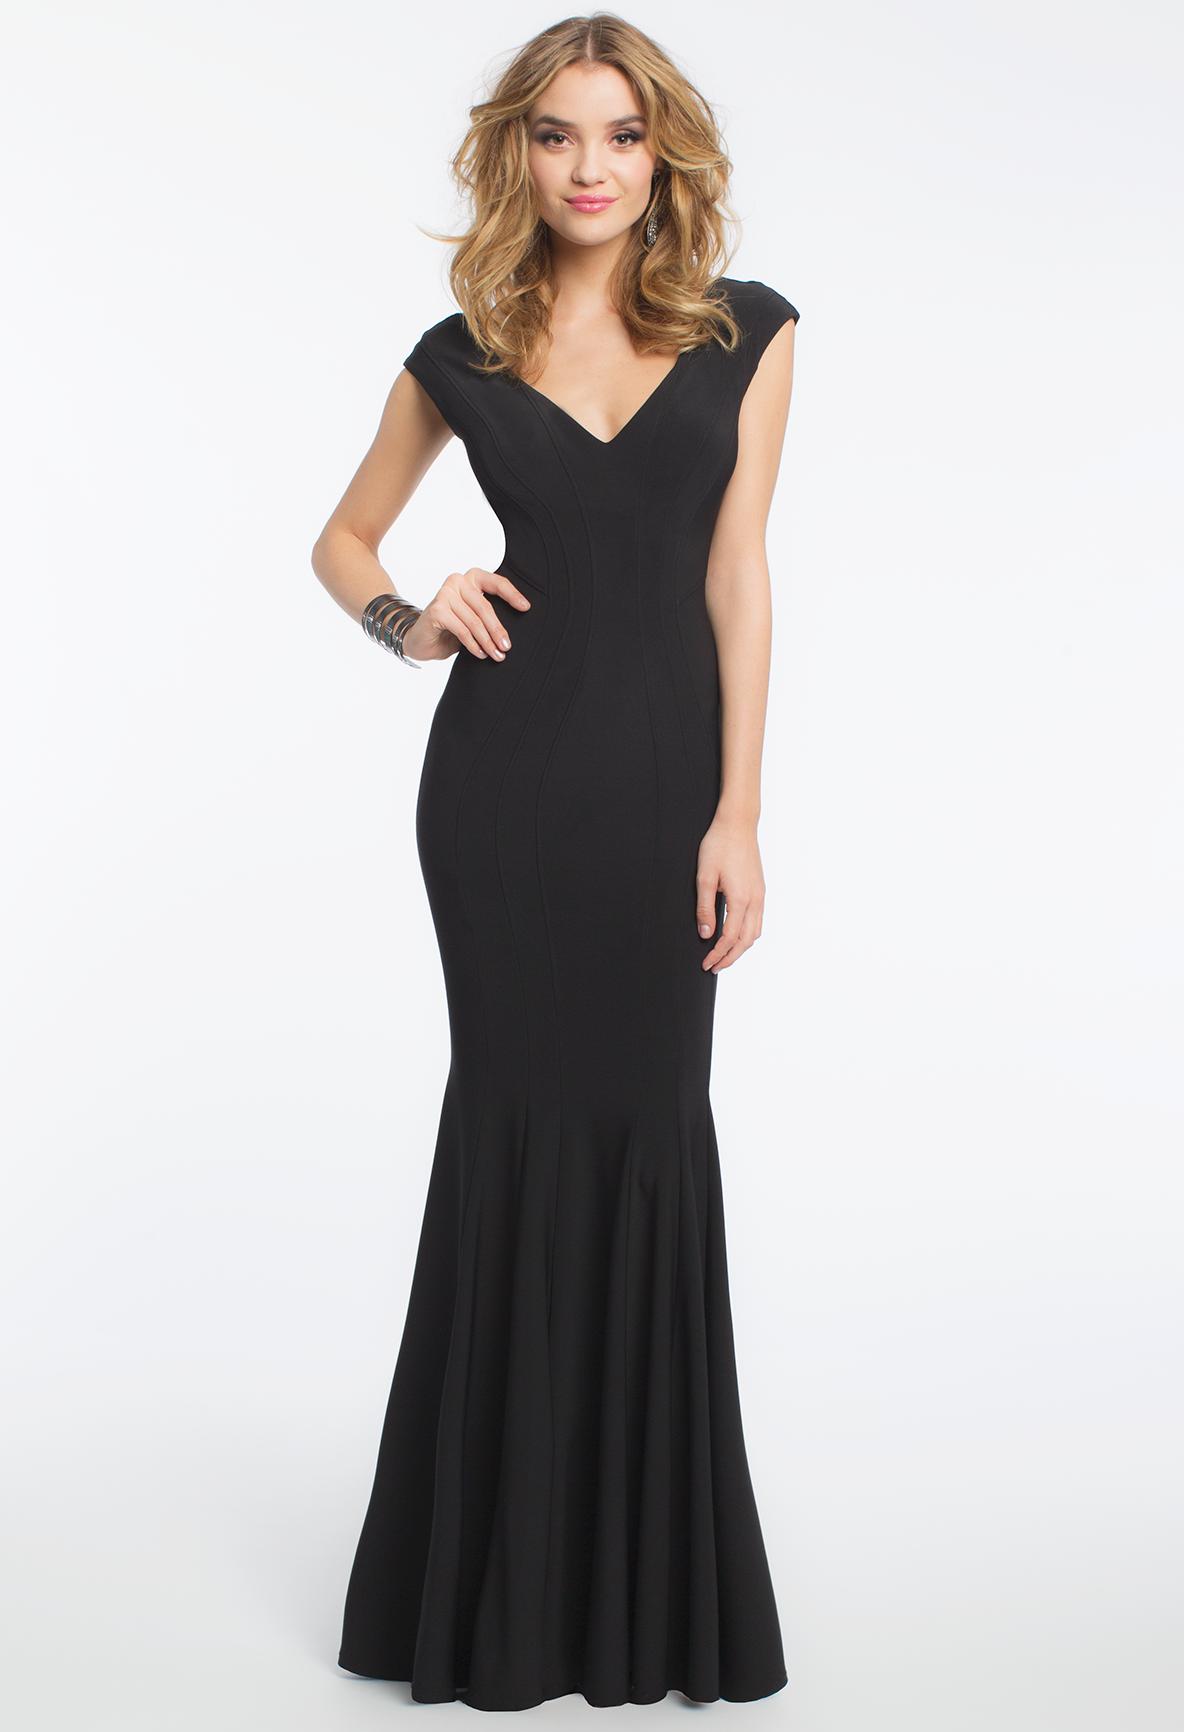 Double V Seam Body Dress camillelavie PROM DRESSES LONG